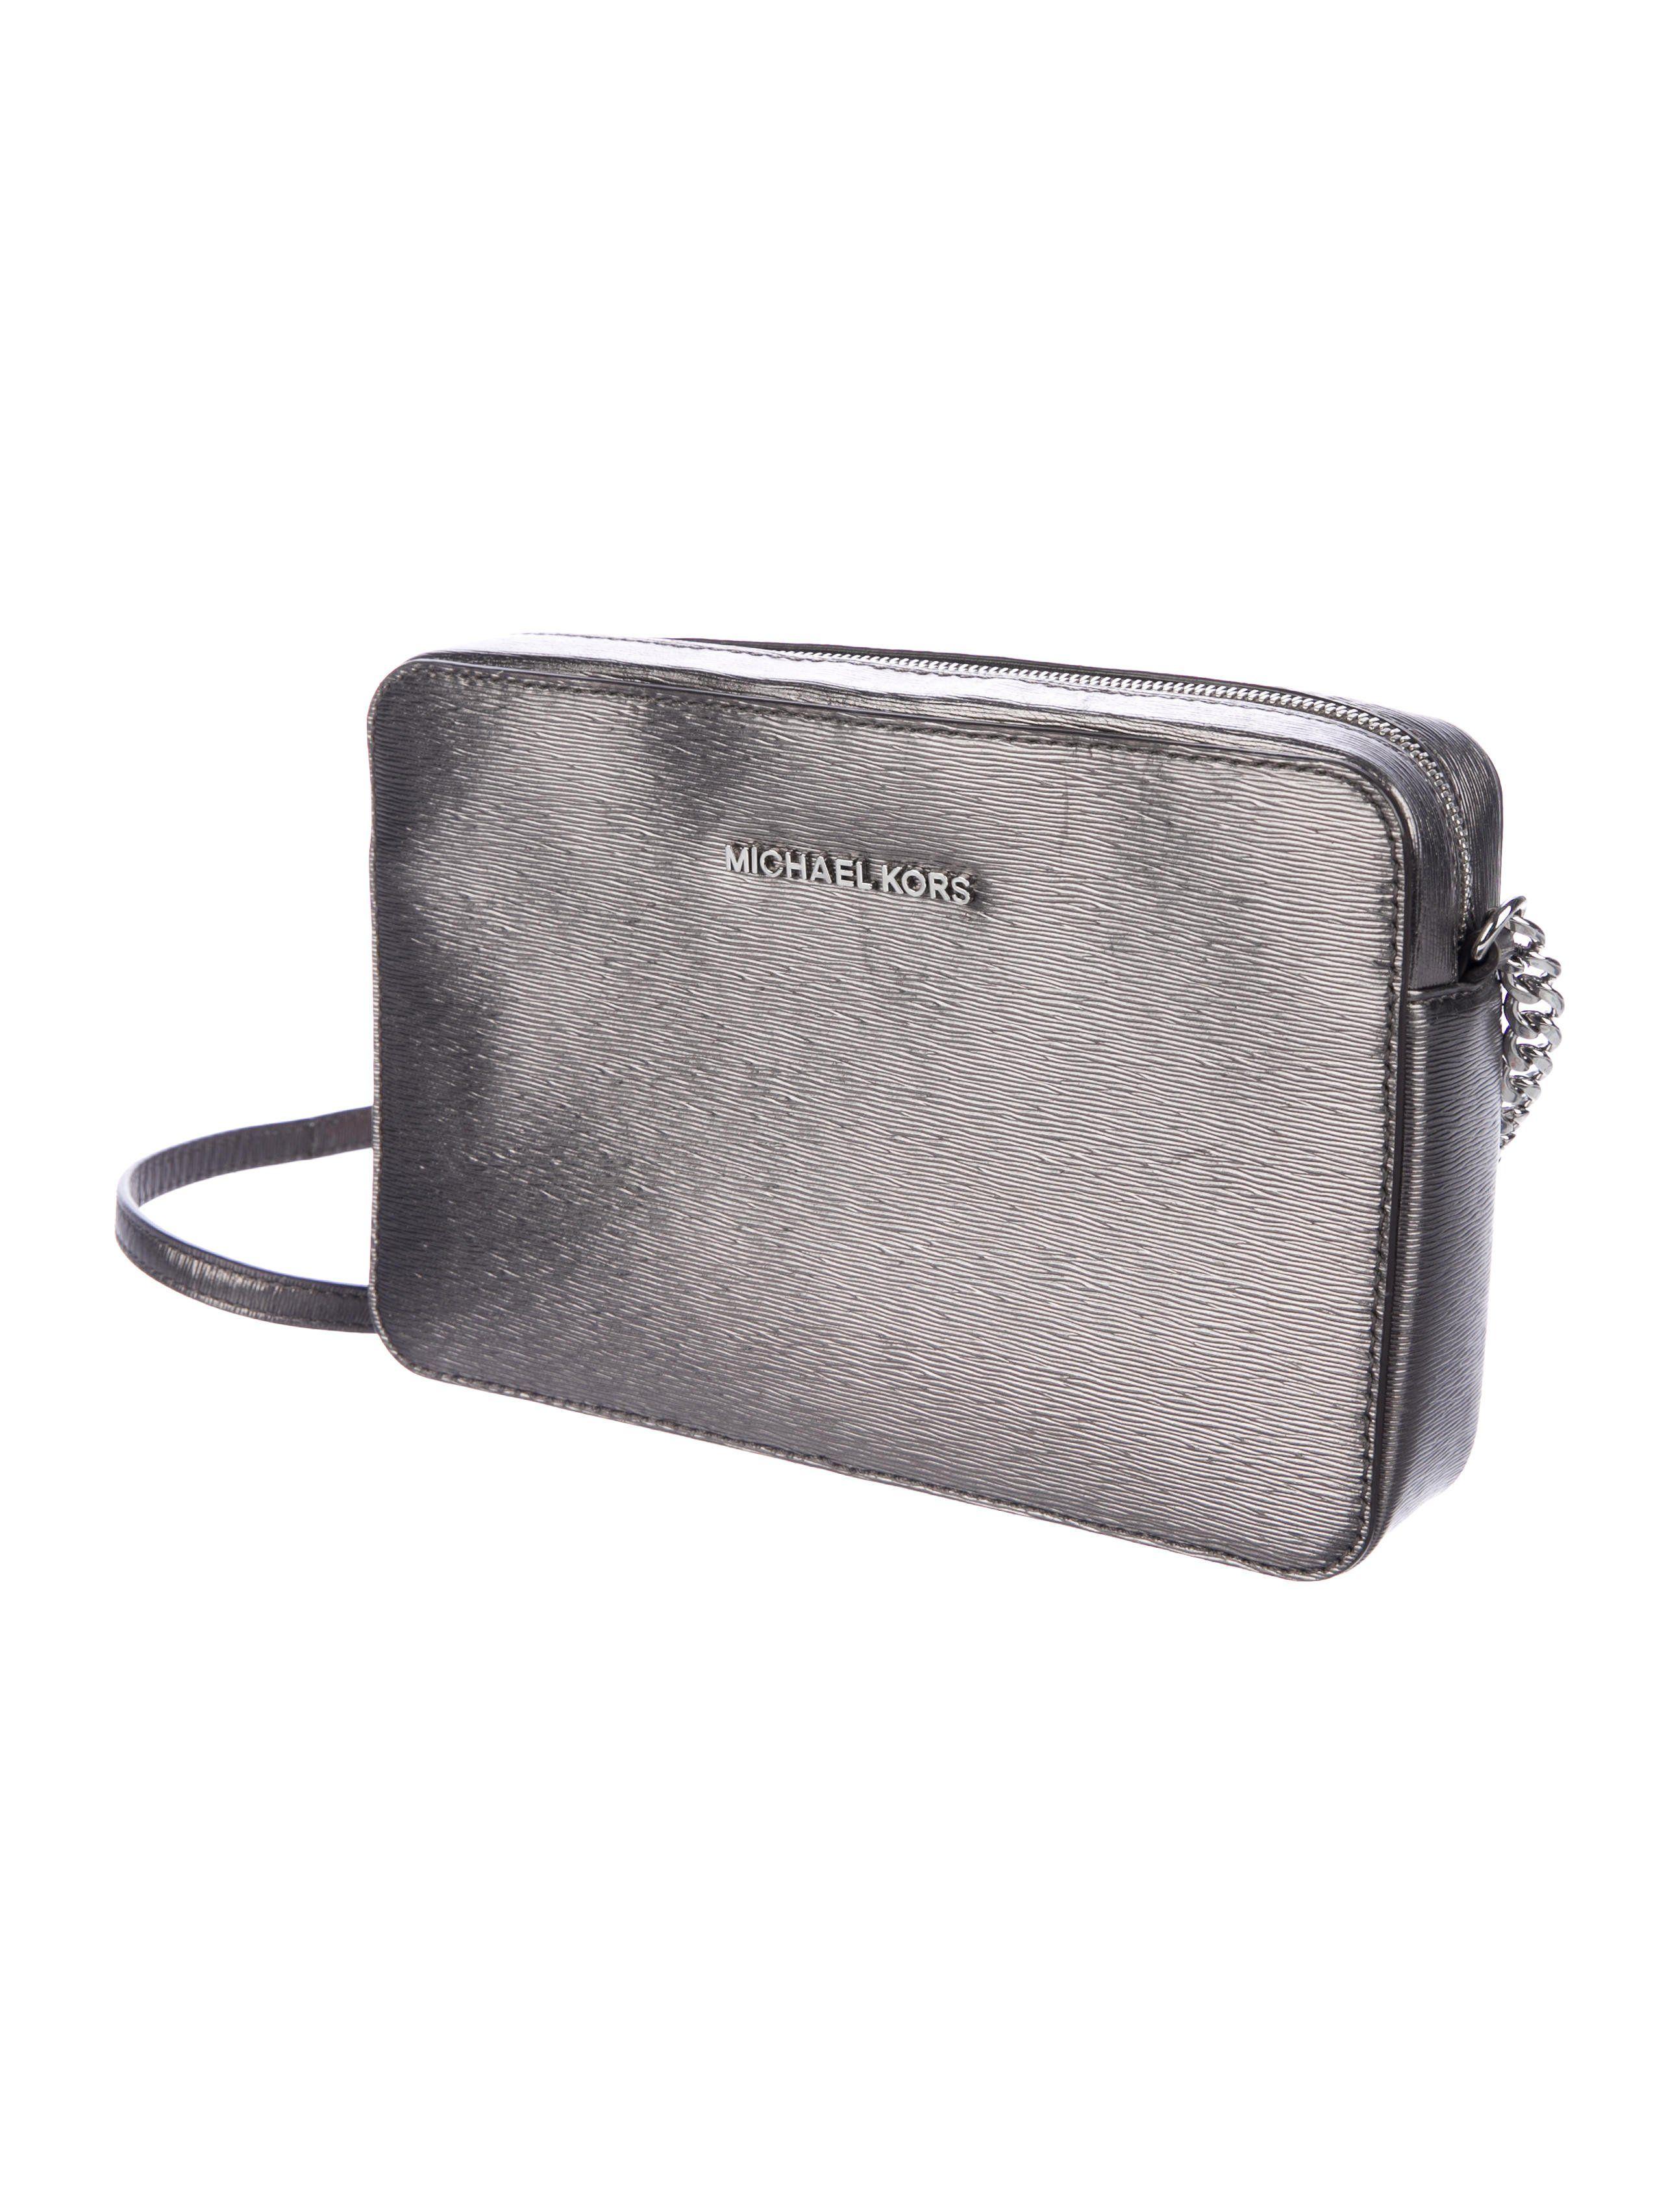 ac69ca35b7bc Metallic gunmetal saffiano leather Michael Michael Kors crossbody bag with  gold-tone hardware, single chain-link shoulder strap leather shoulder  guard, logo ...